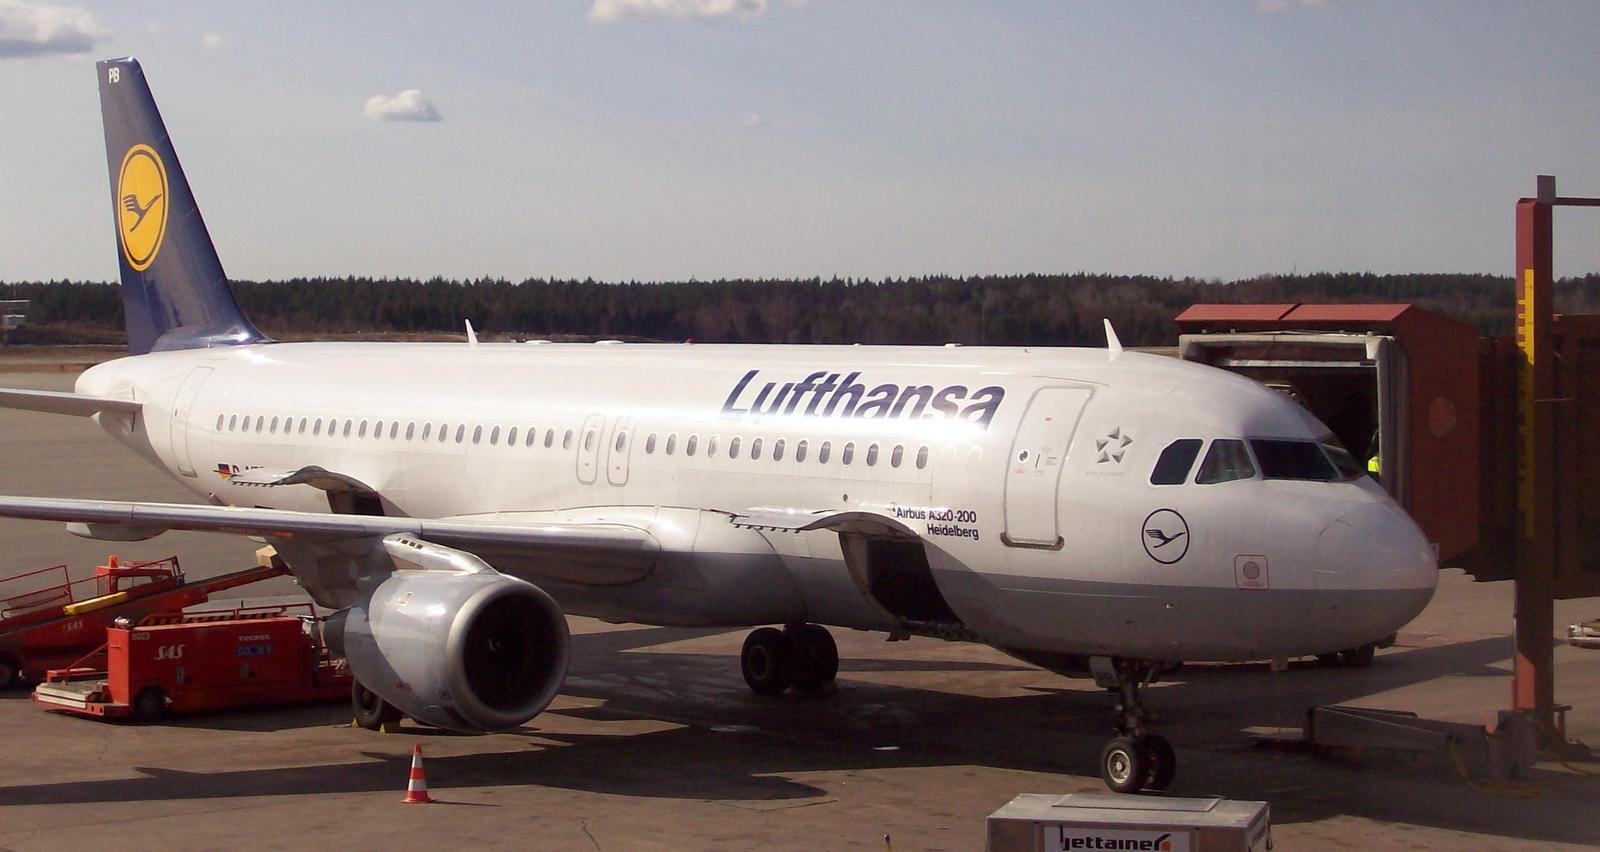 Lufthansa in Stockholm-Arlanda